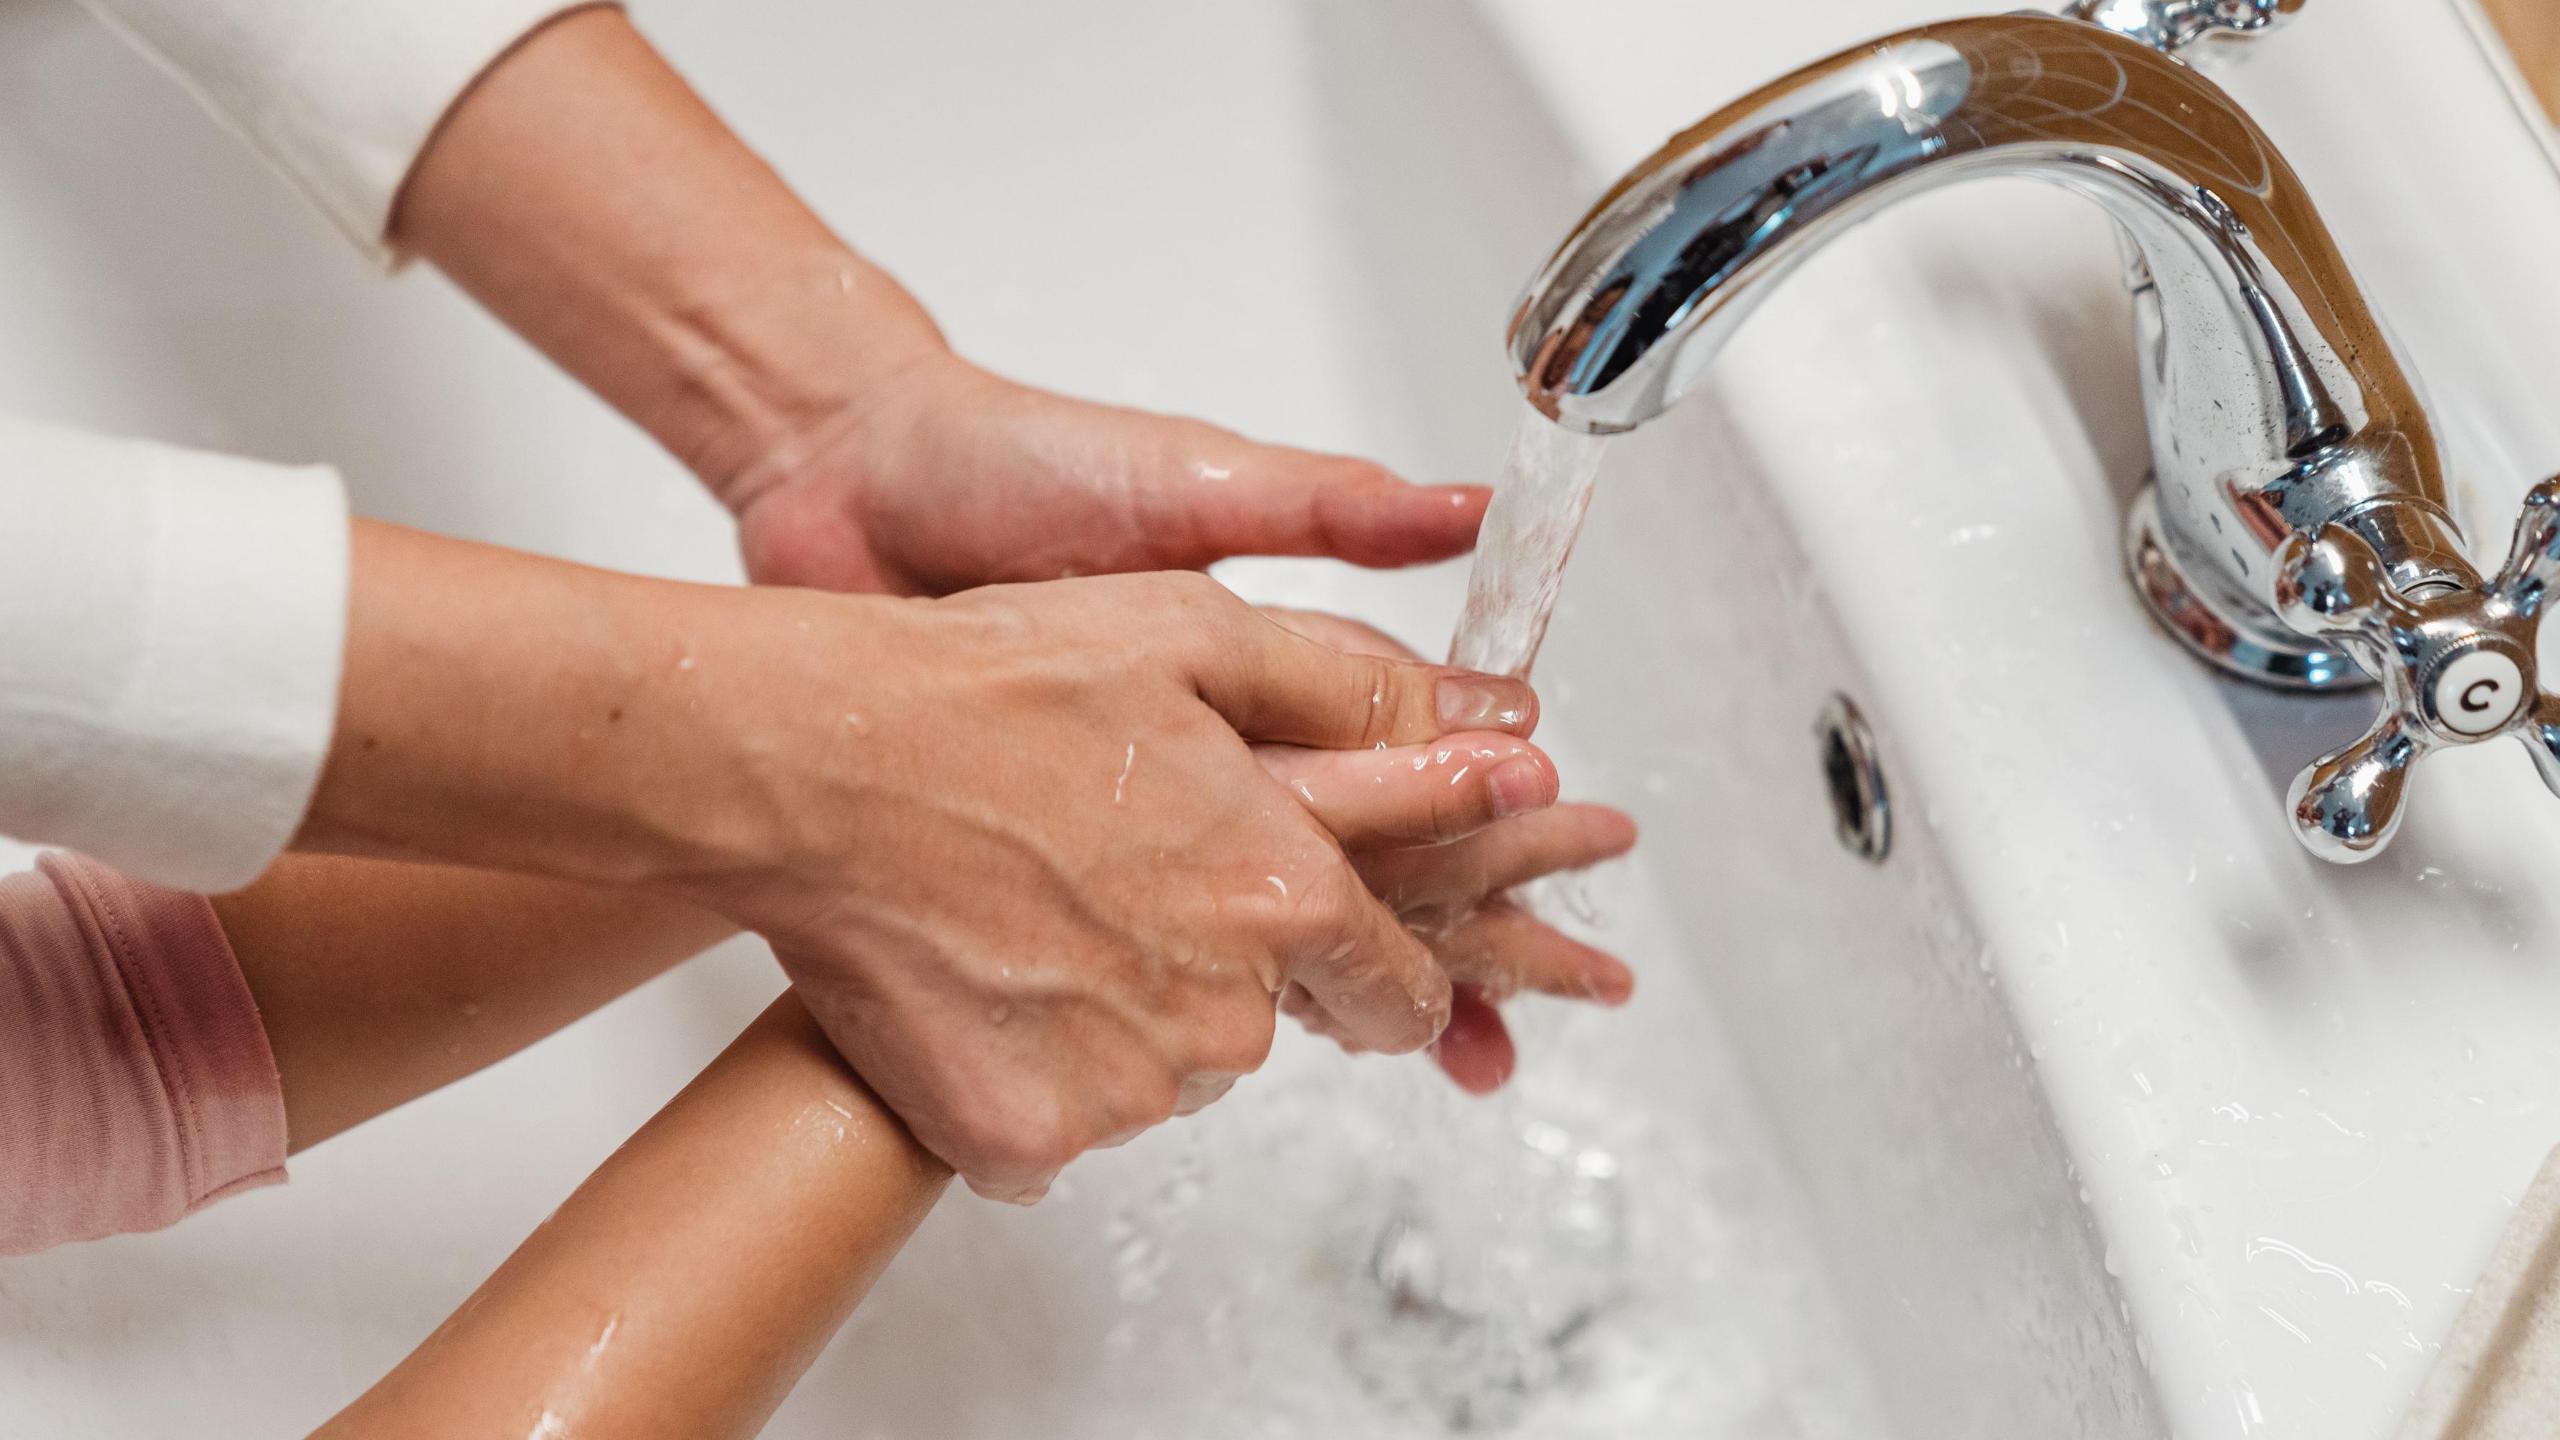 Newsweek Amplify - COVID19 Hand Hygiene